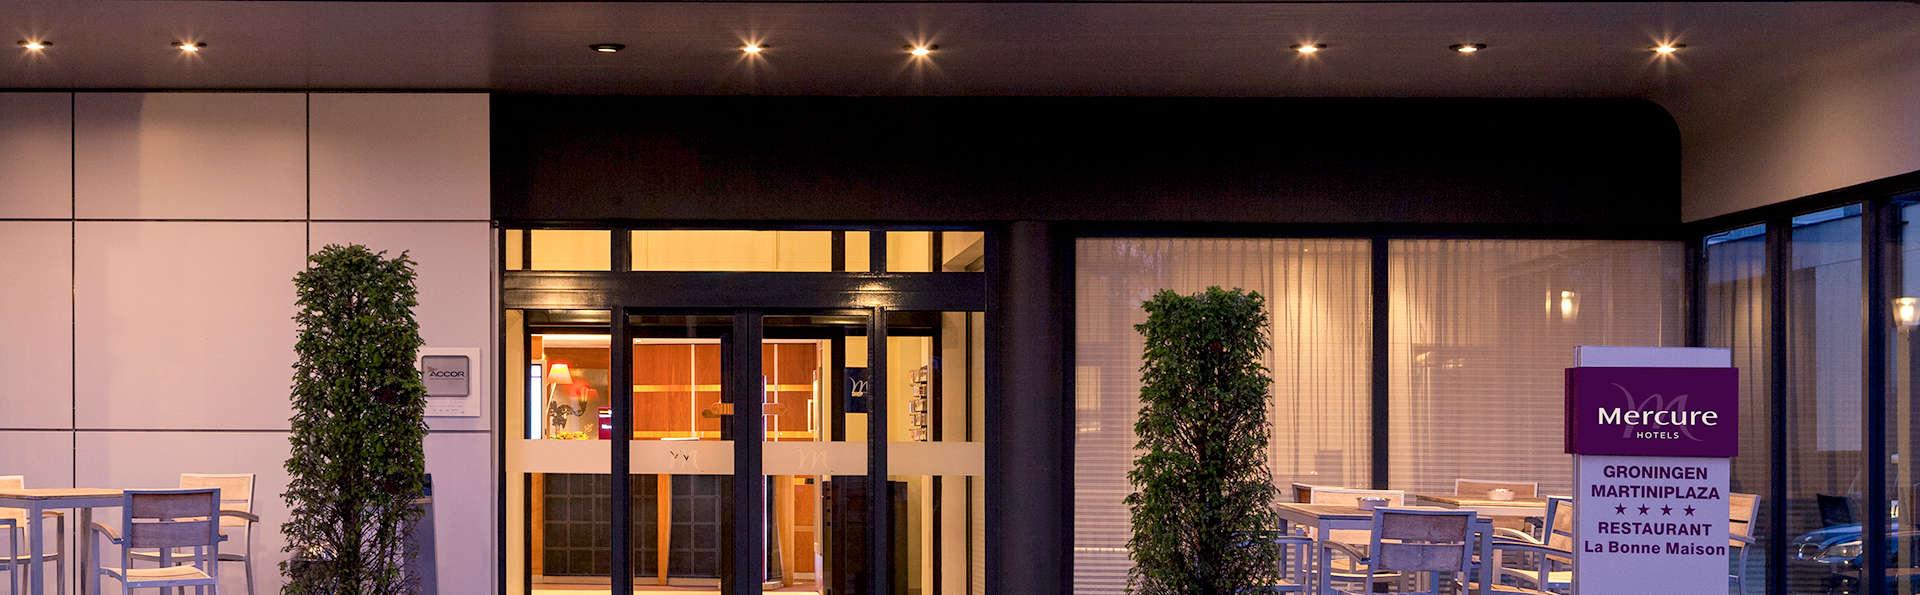 Mercure Hotel Groningen Martiniplaza - Edit_Front.jpg